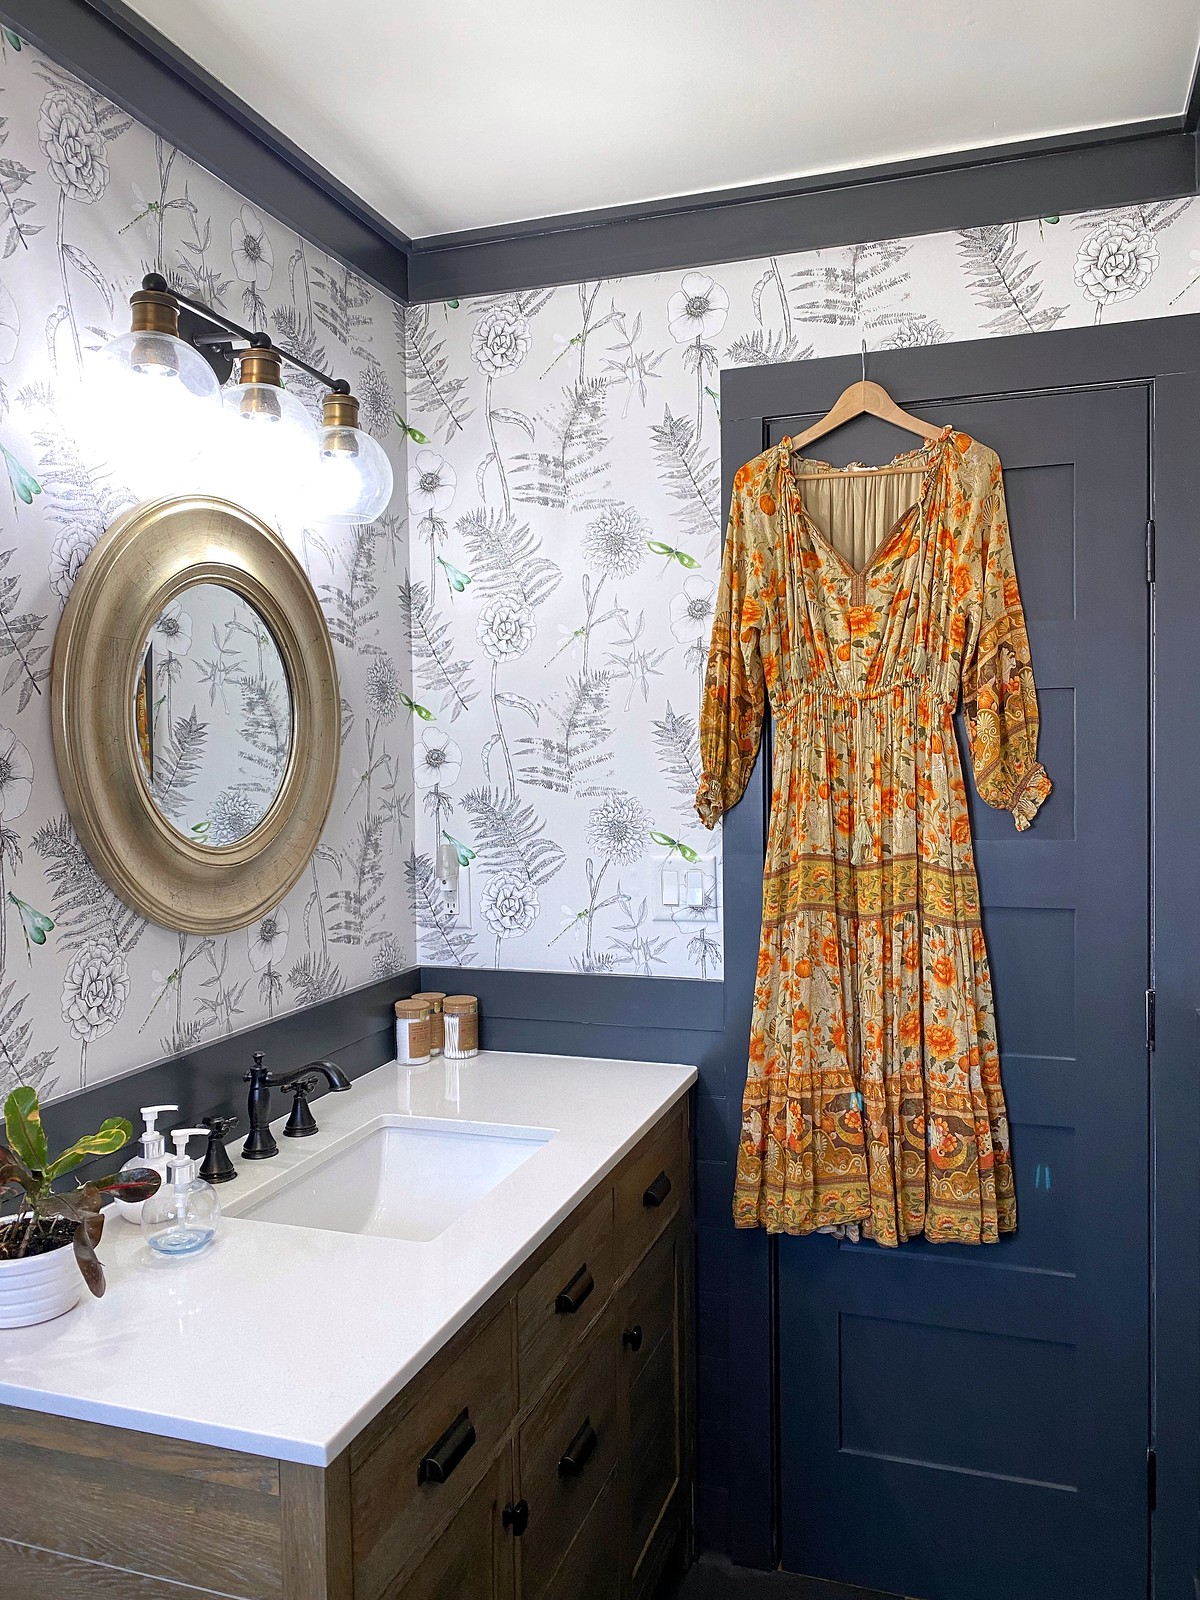 Wallpapered Bathroom | Wallpaper Bathroom | Powder Room | Black Door Black Trim | Flower Leaf Gray Wallpaper | Farmhouse Style Bathroom Renovation Inspiration